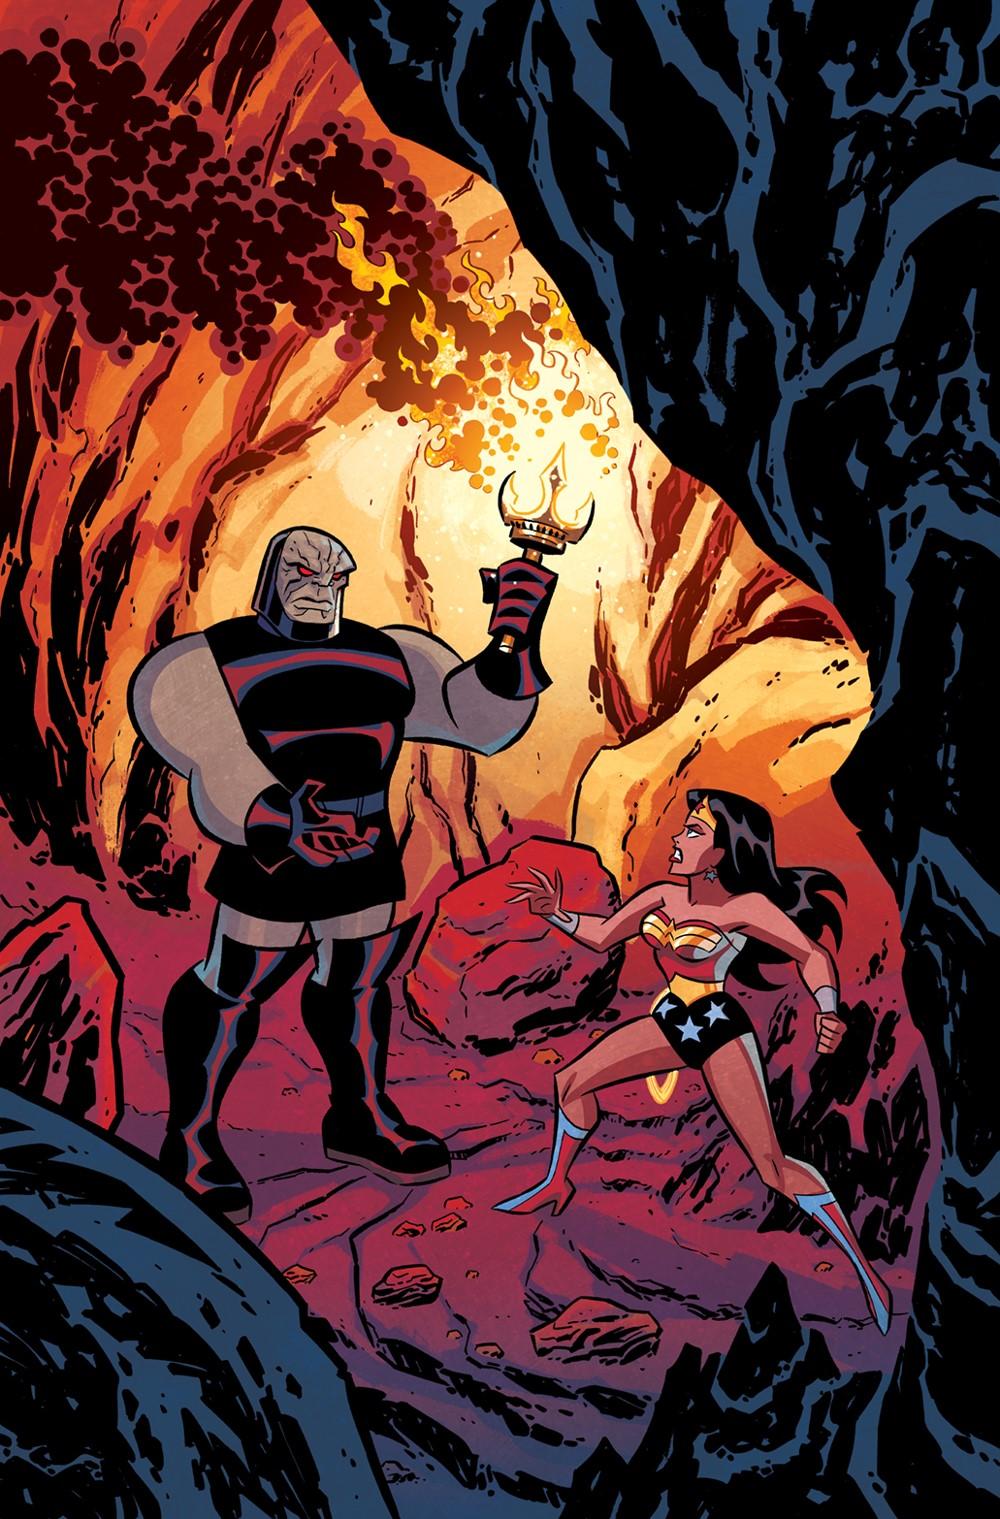 JL-Infinity-Cv7-NOT-FINAL DC Comics December 2021 Solicitations